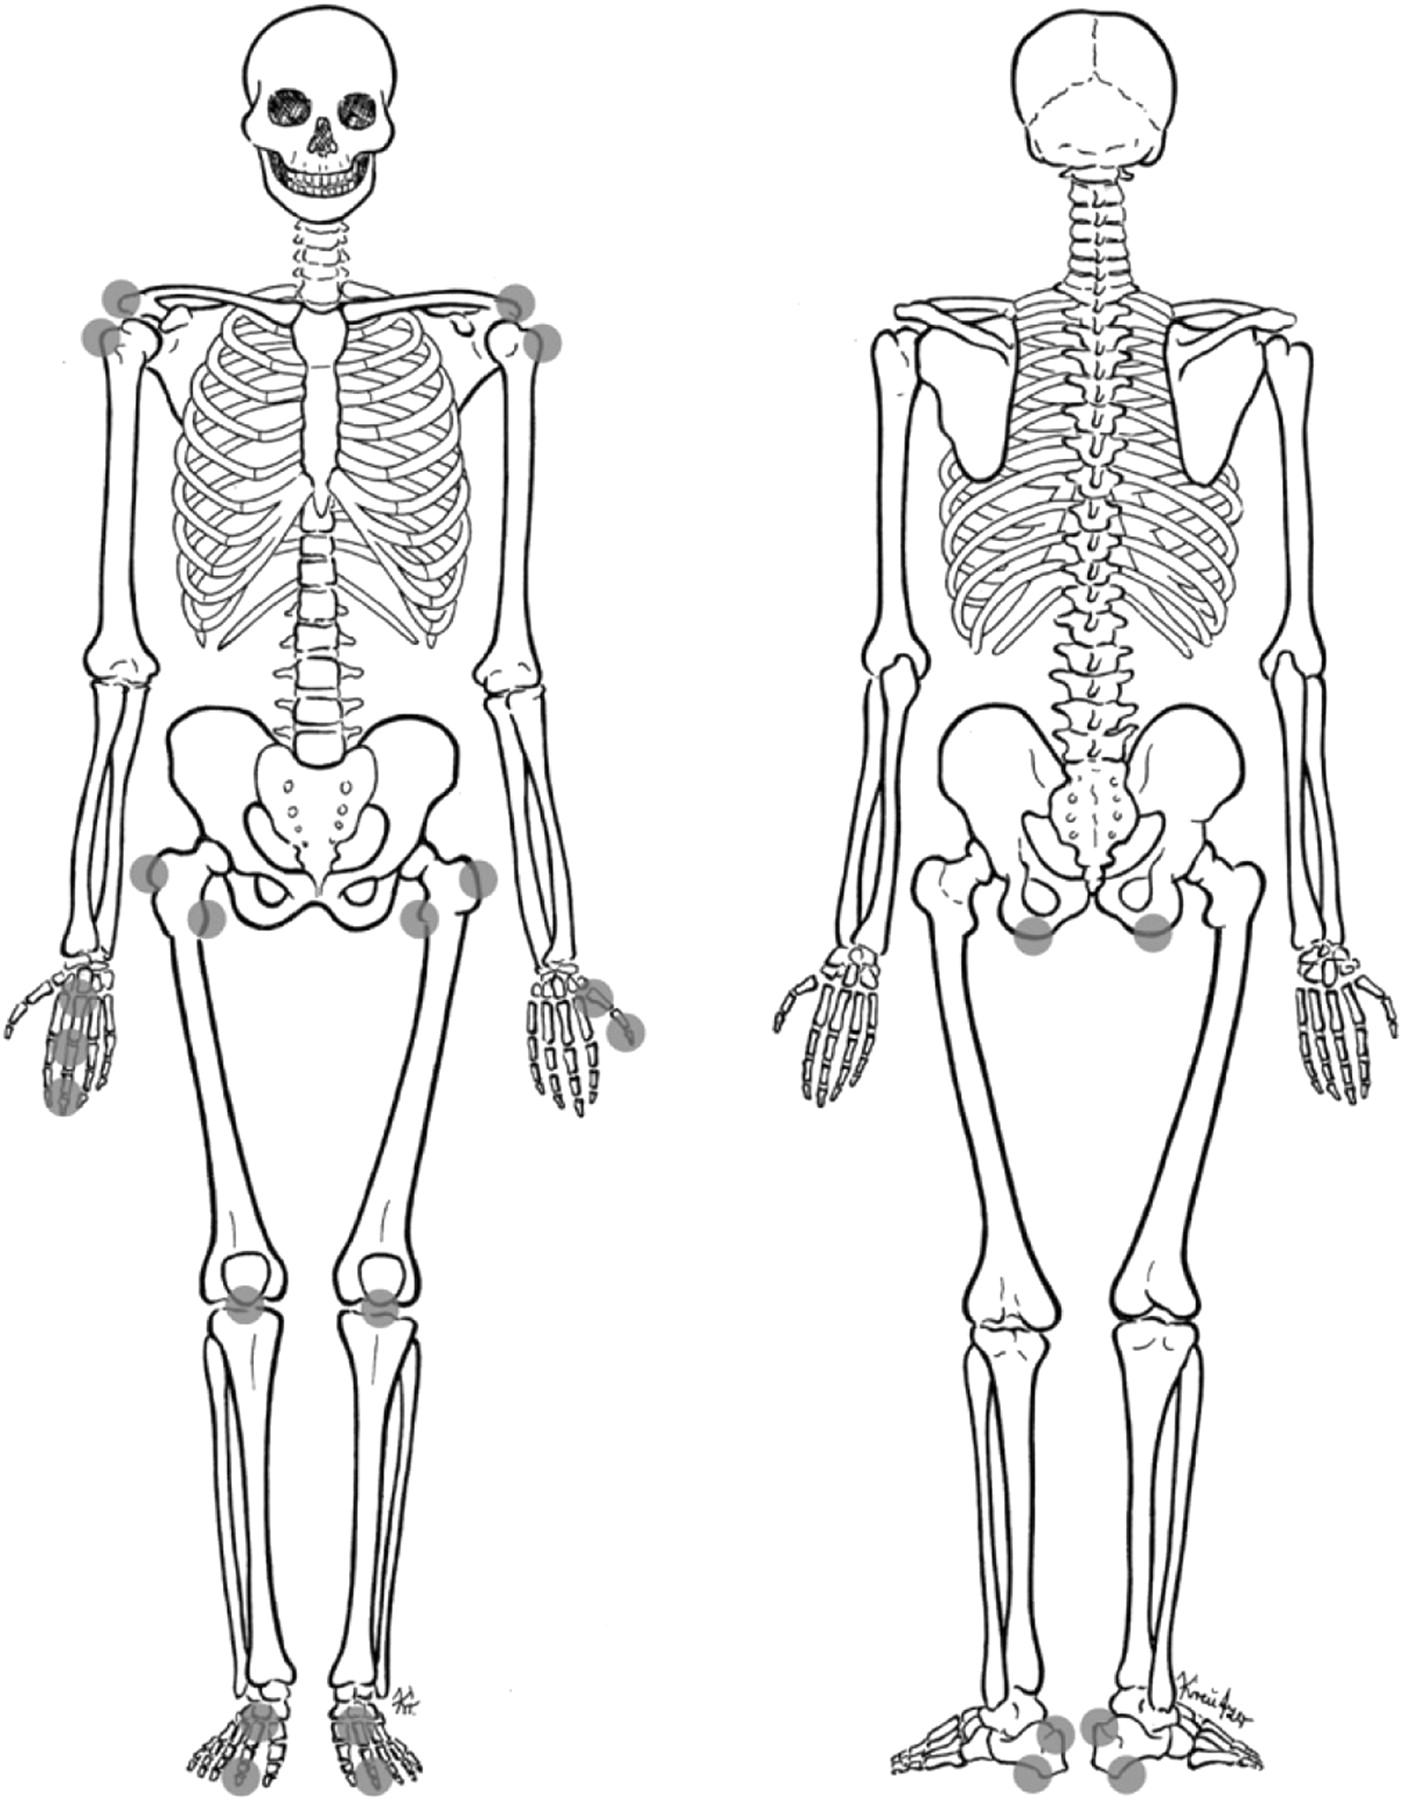 Mri Of Enthesitis Of The Appendicular Skeleton In Spondyloarthritis